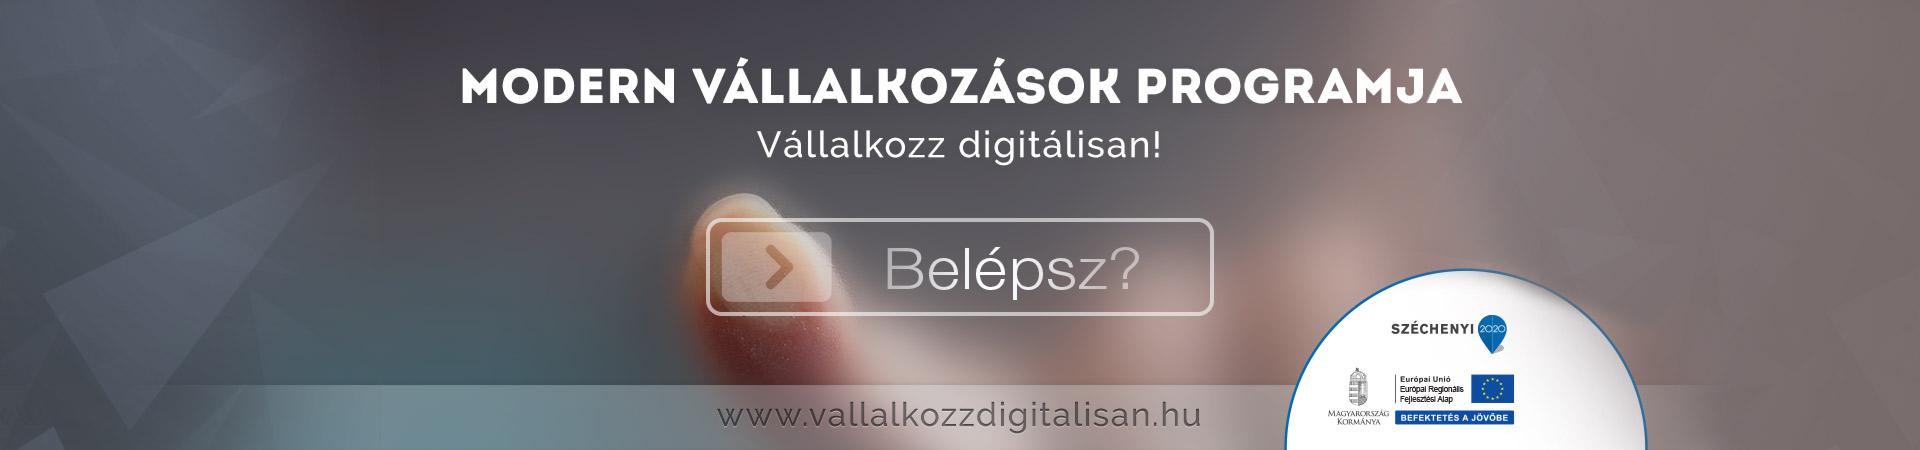 banner-vallalkozz-digitalisan